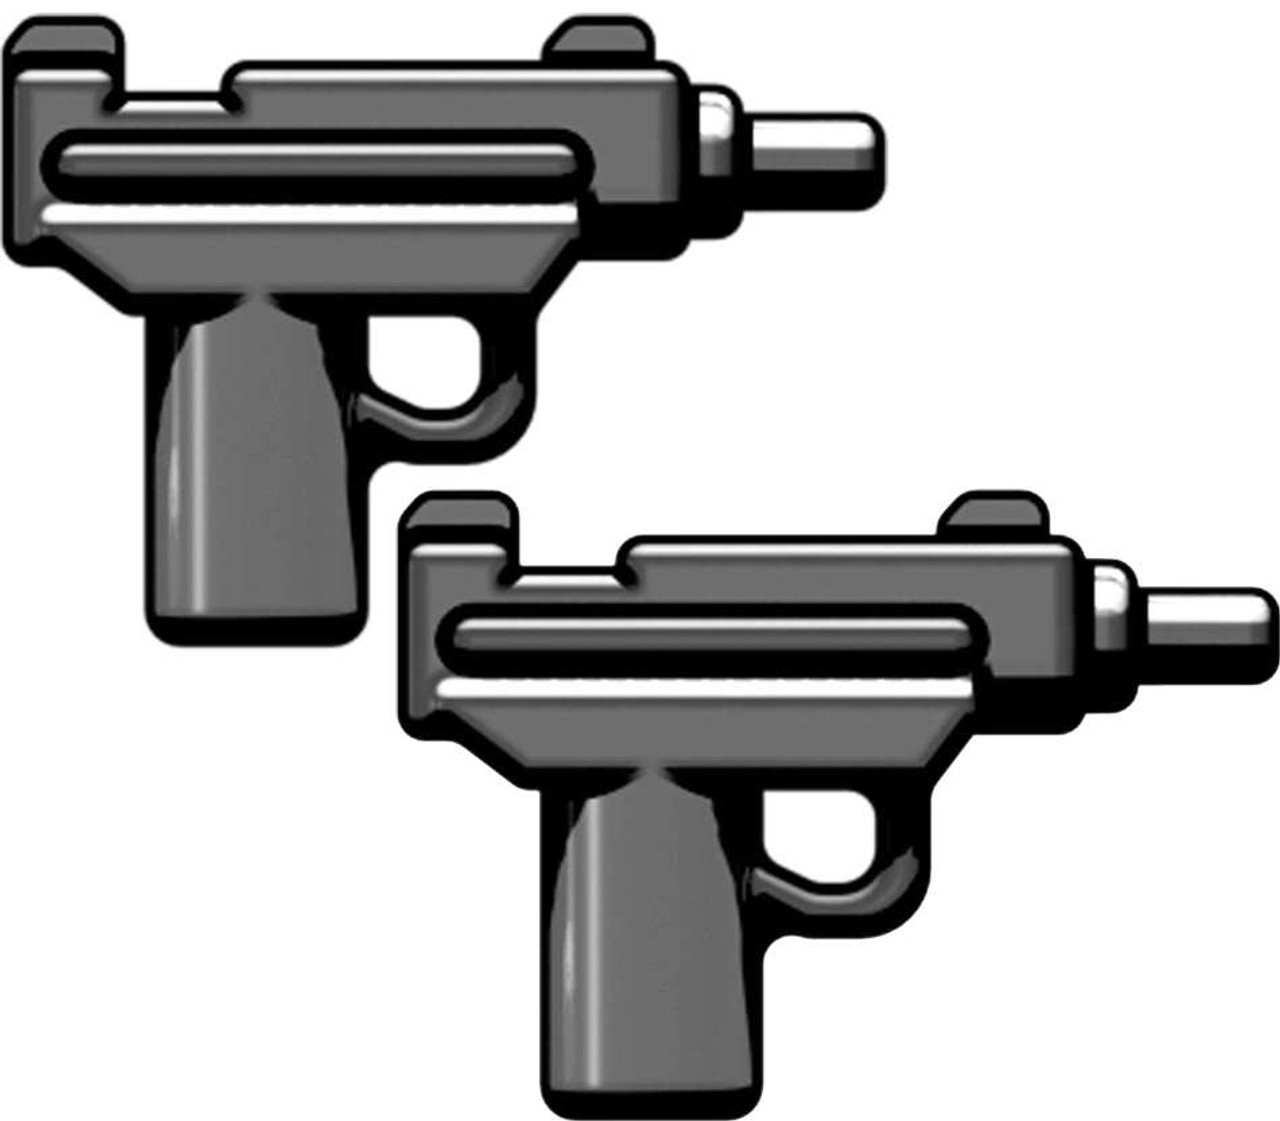 BrickArms Weapons Set of 2 Micro Uzi SMG 2.5-Inch [Gunmetal]